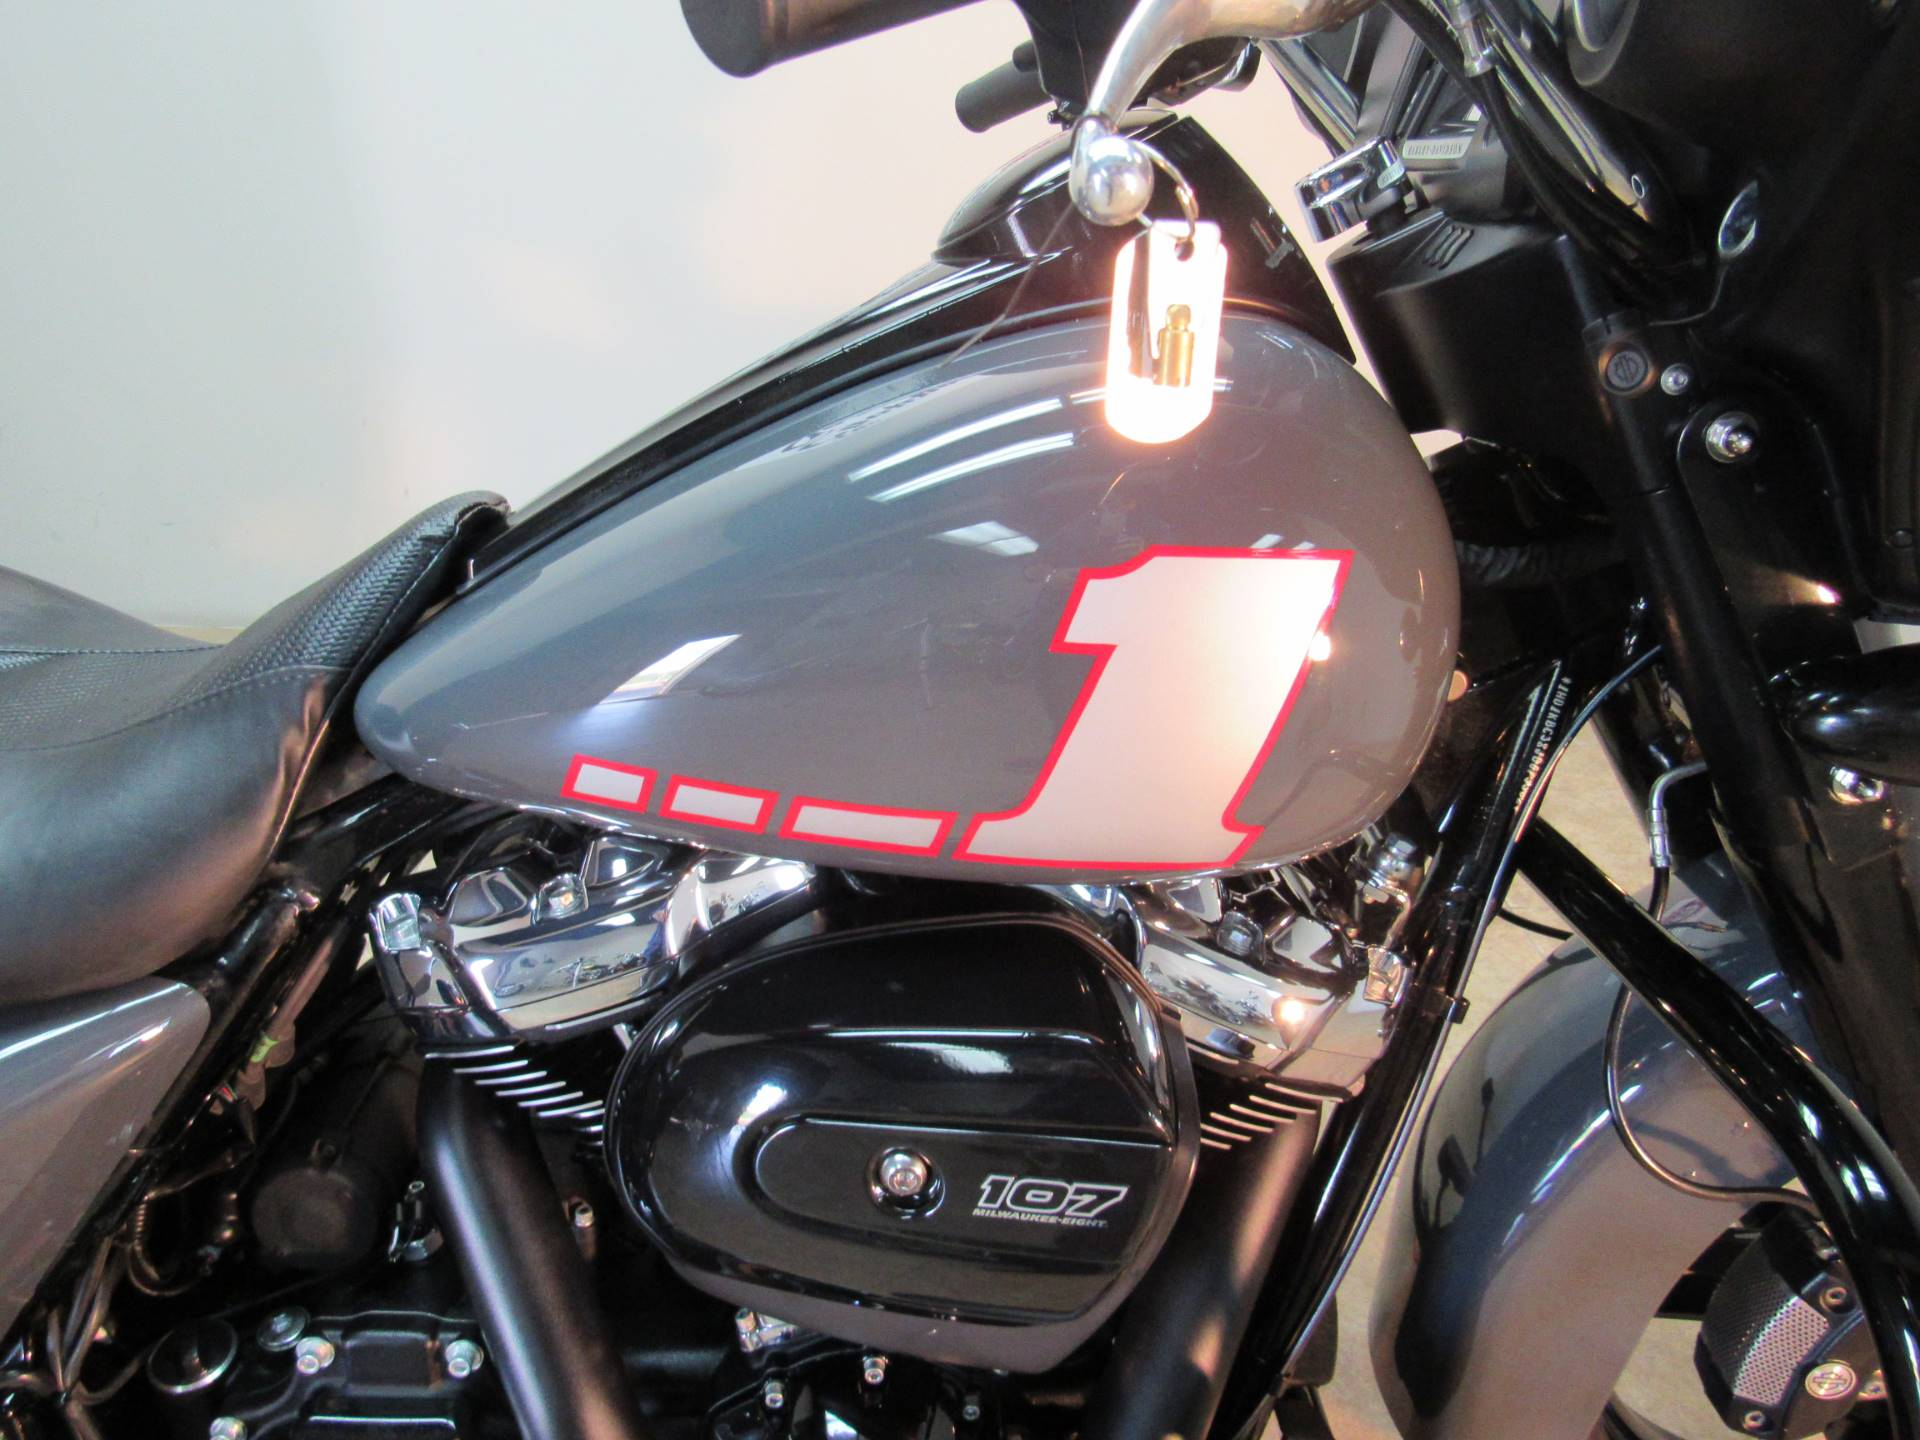 2018 Harley-Davidson Street Glide Special 9